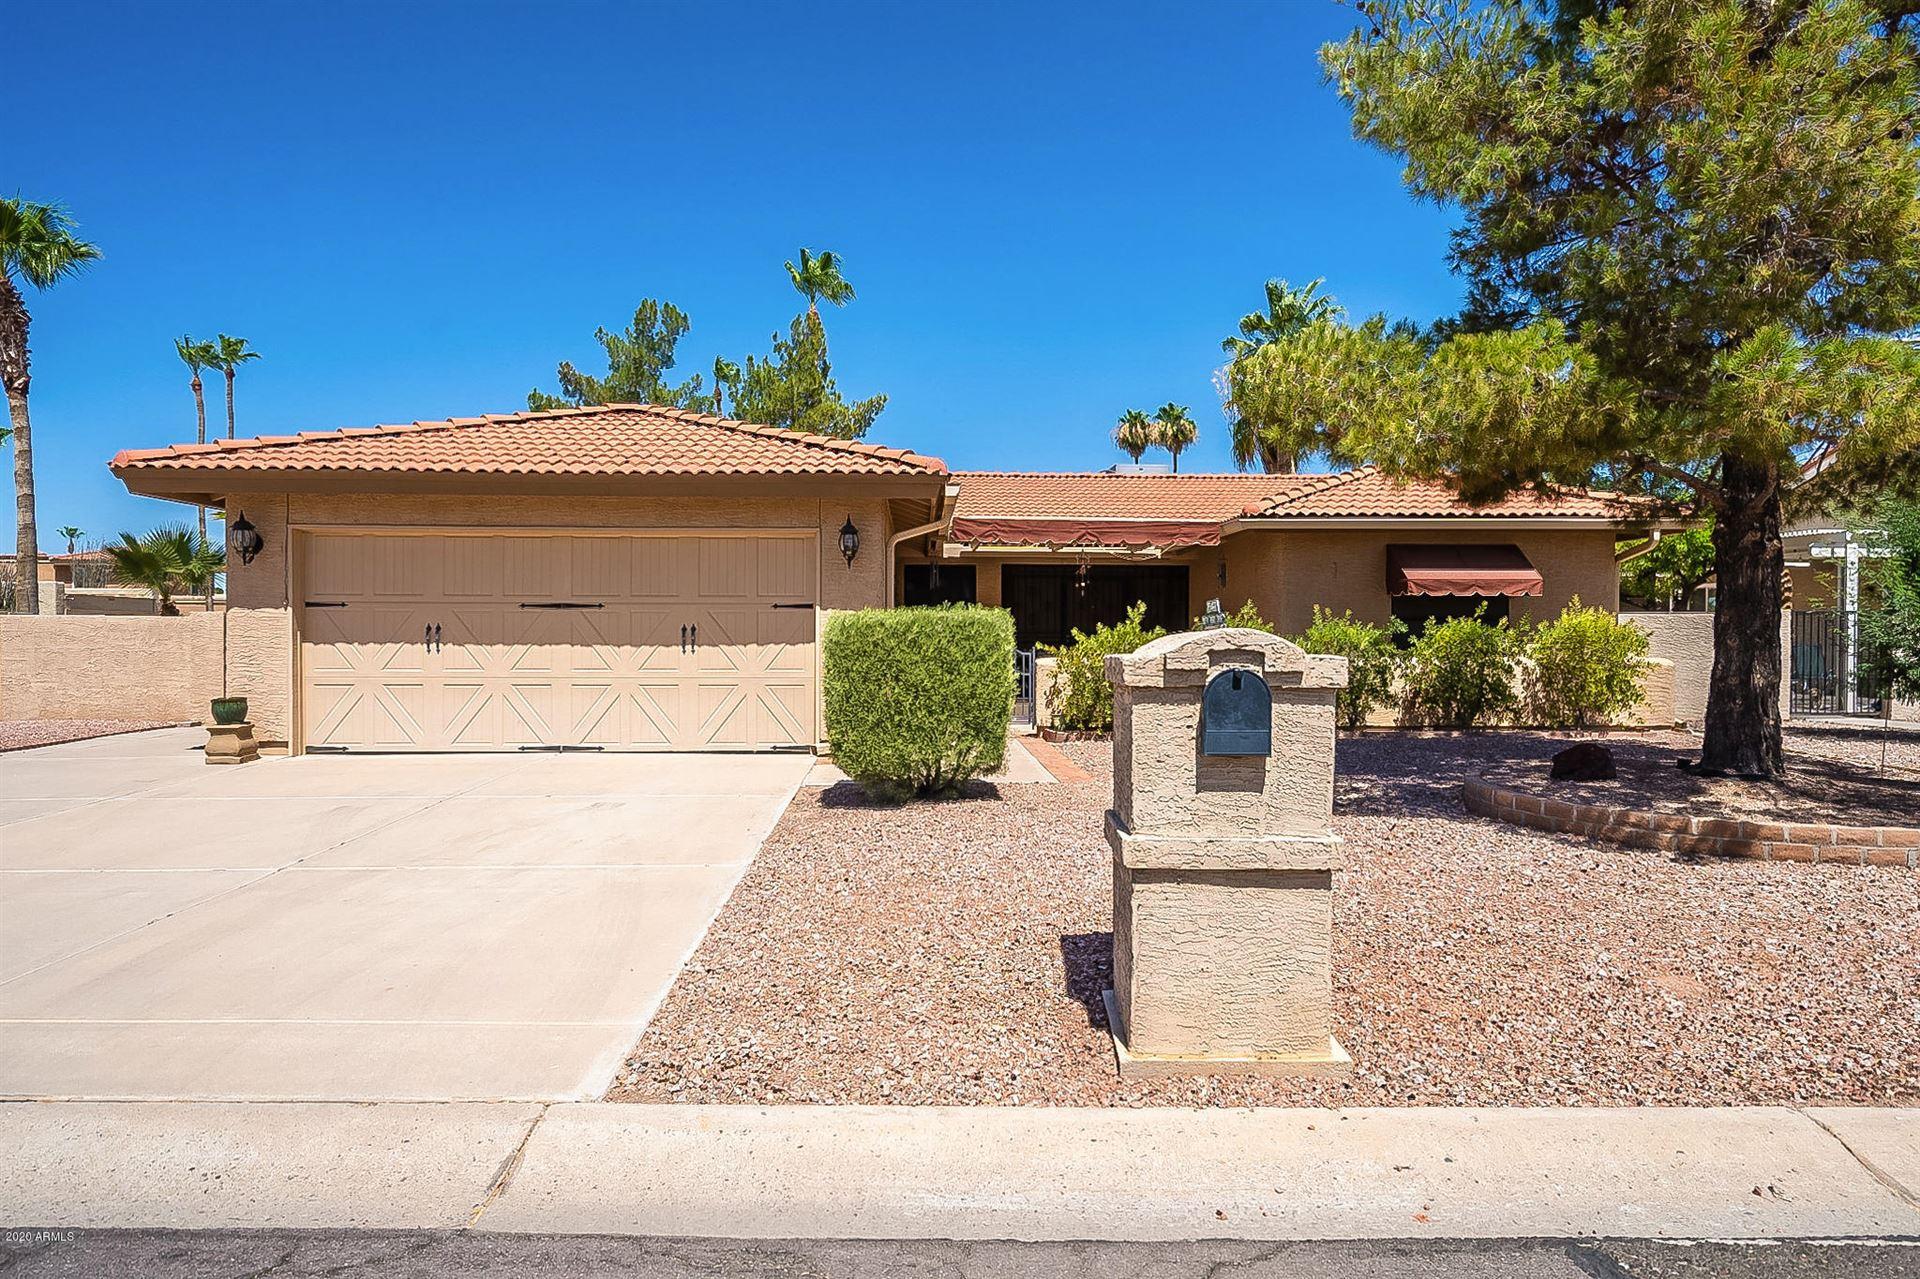 25468 S TRURO Drive, Sun Lakes, AZ 85248 - MLS#: 6098437